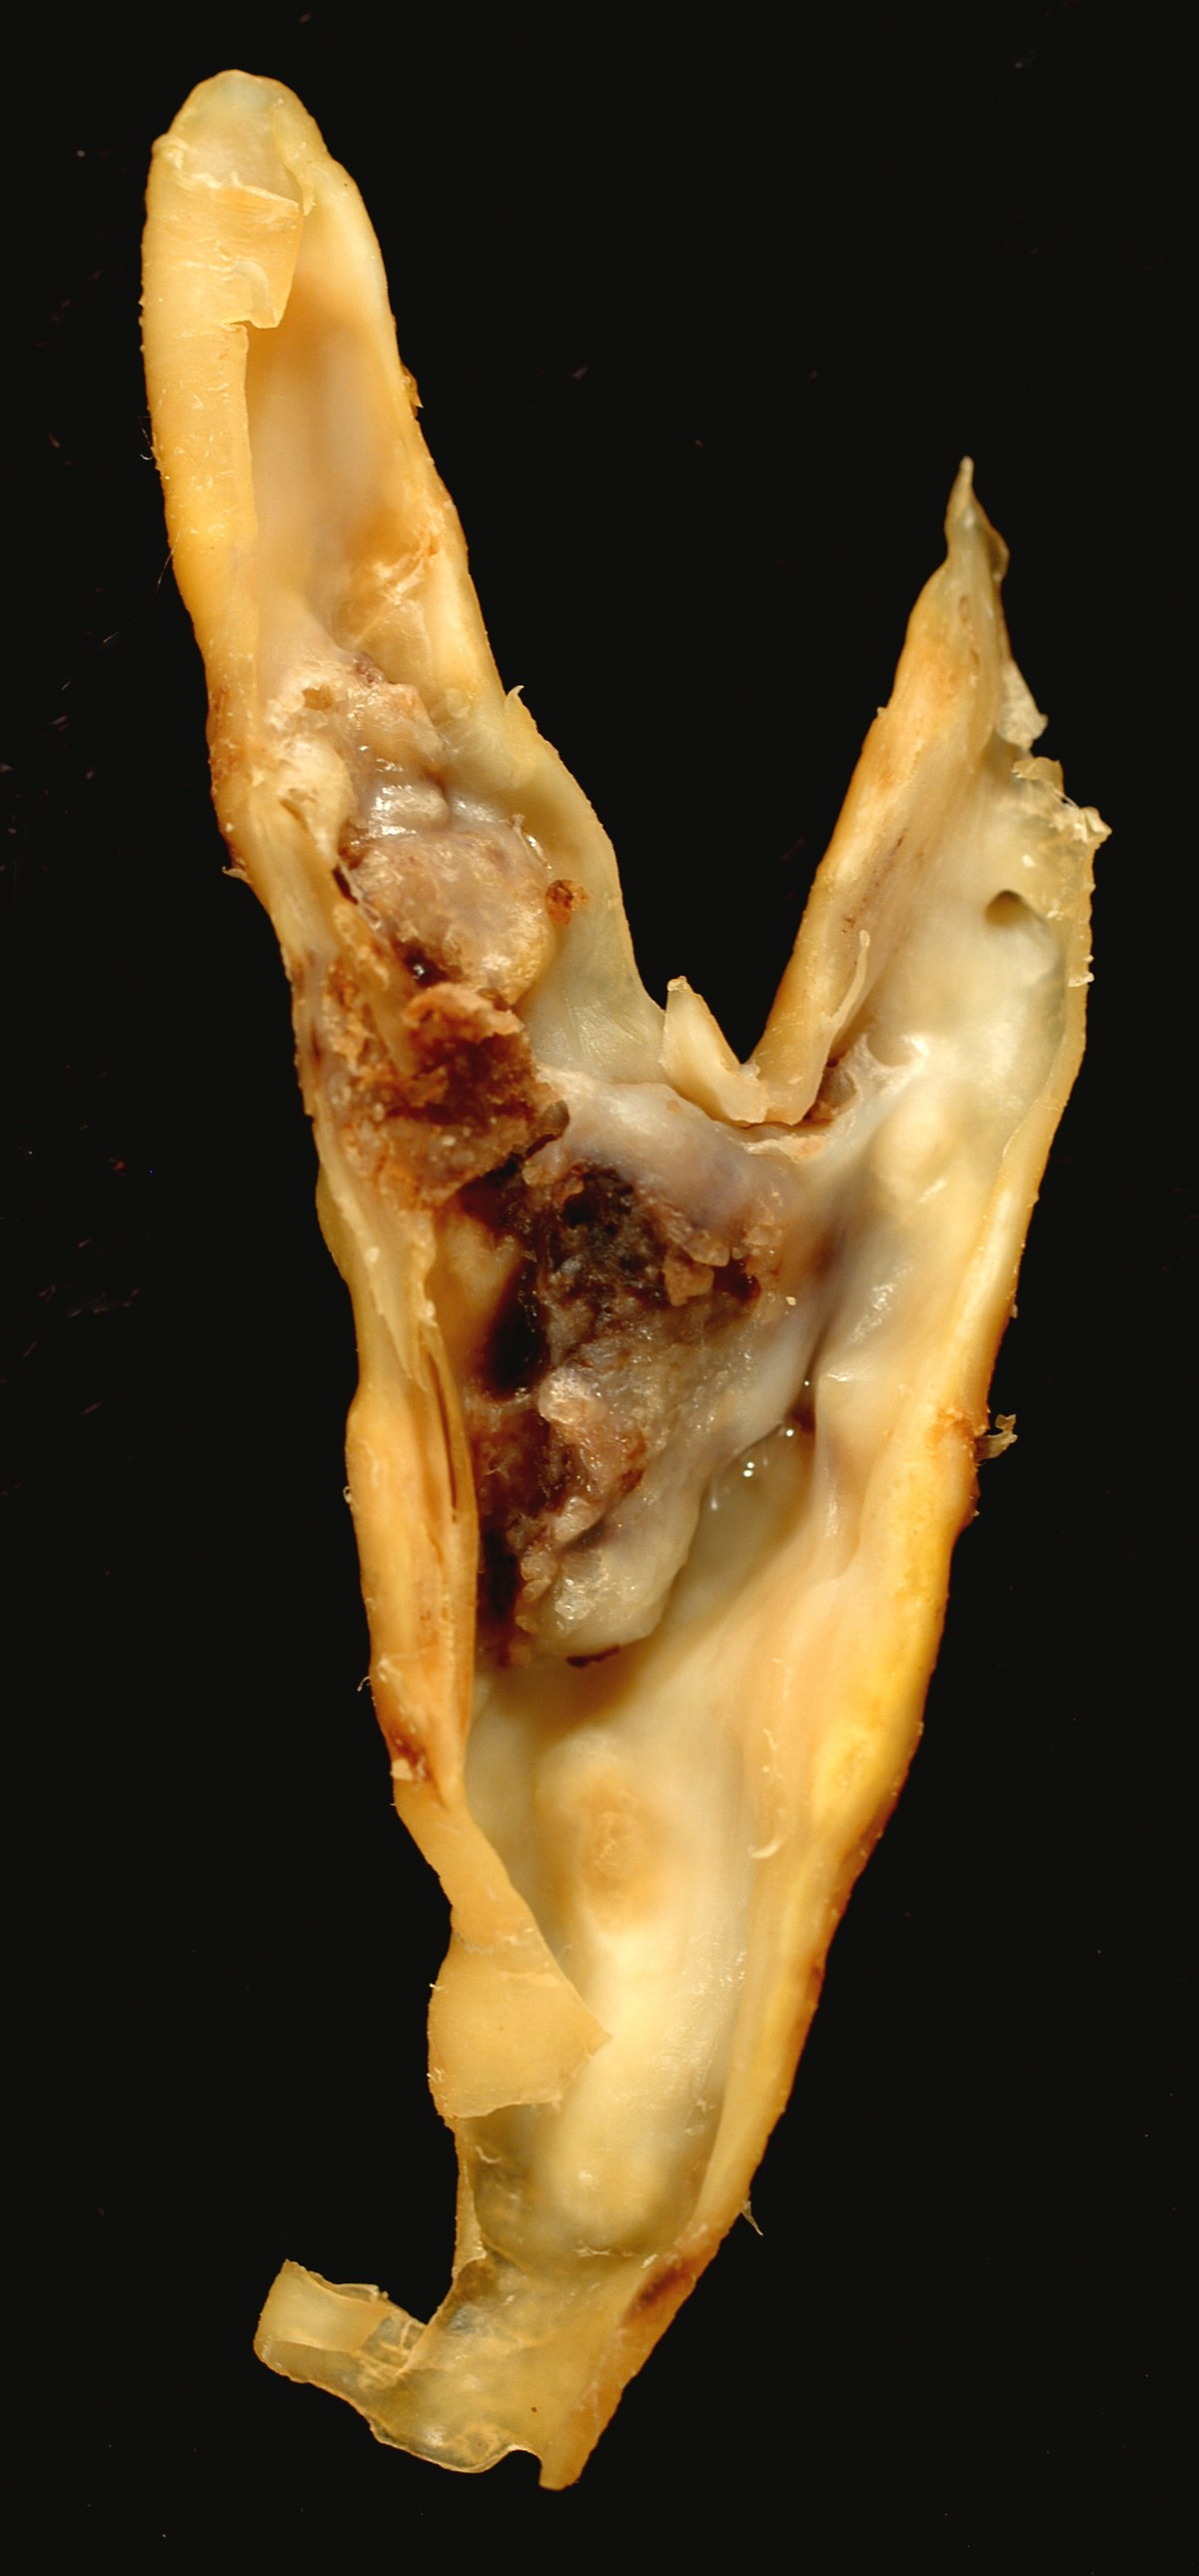 Tricocefaloza - Triocefalele sunt o geohelmint